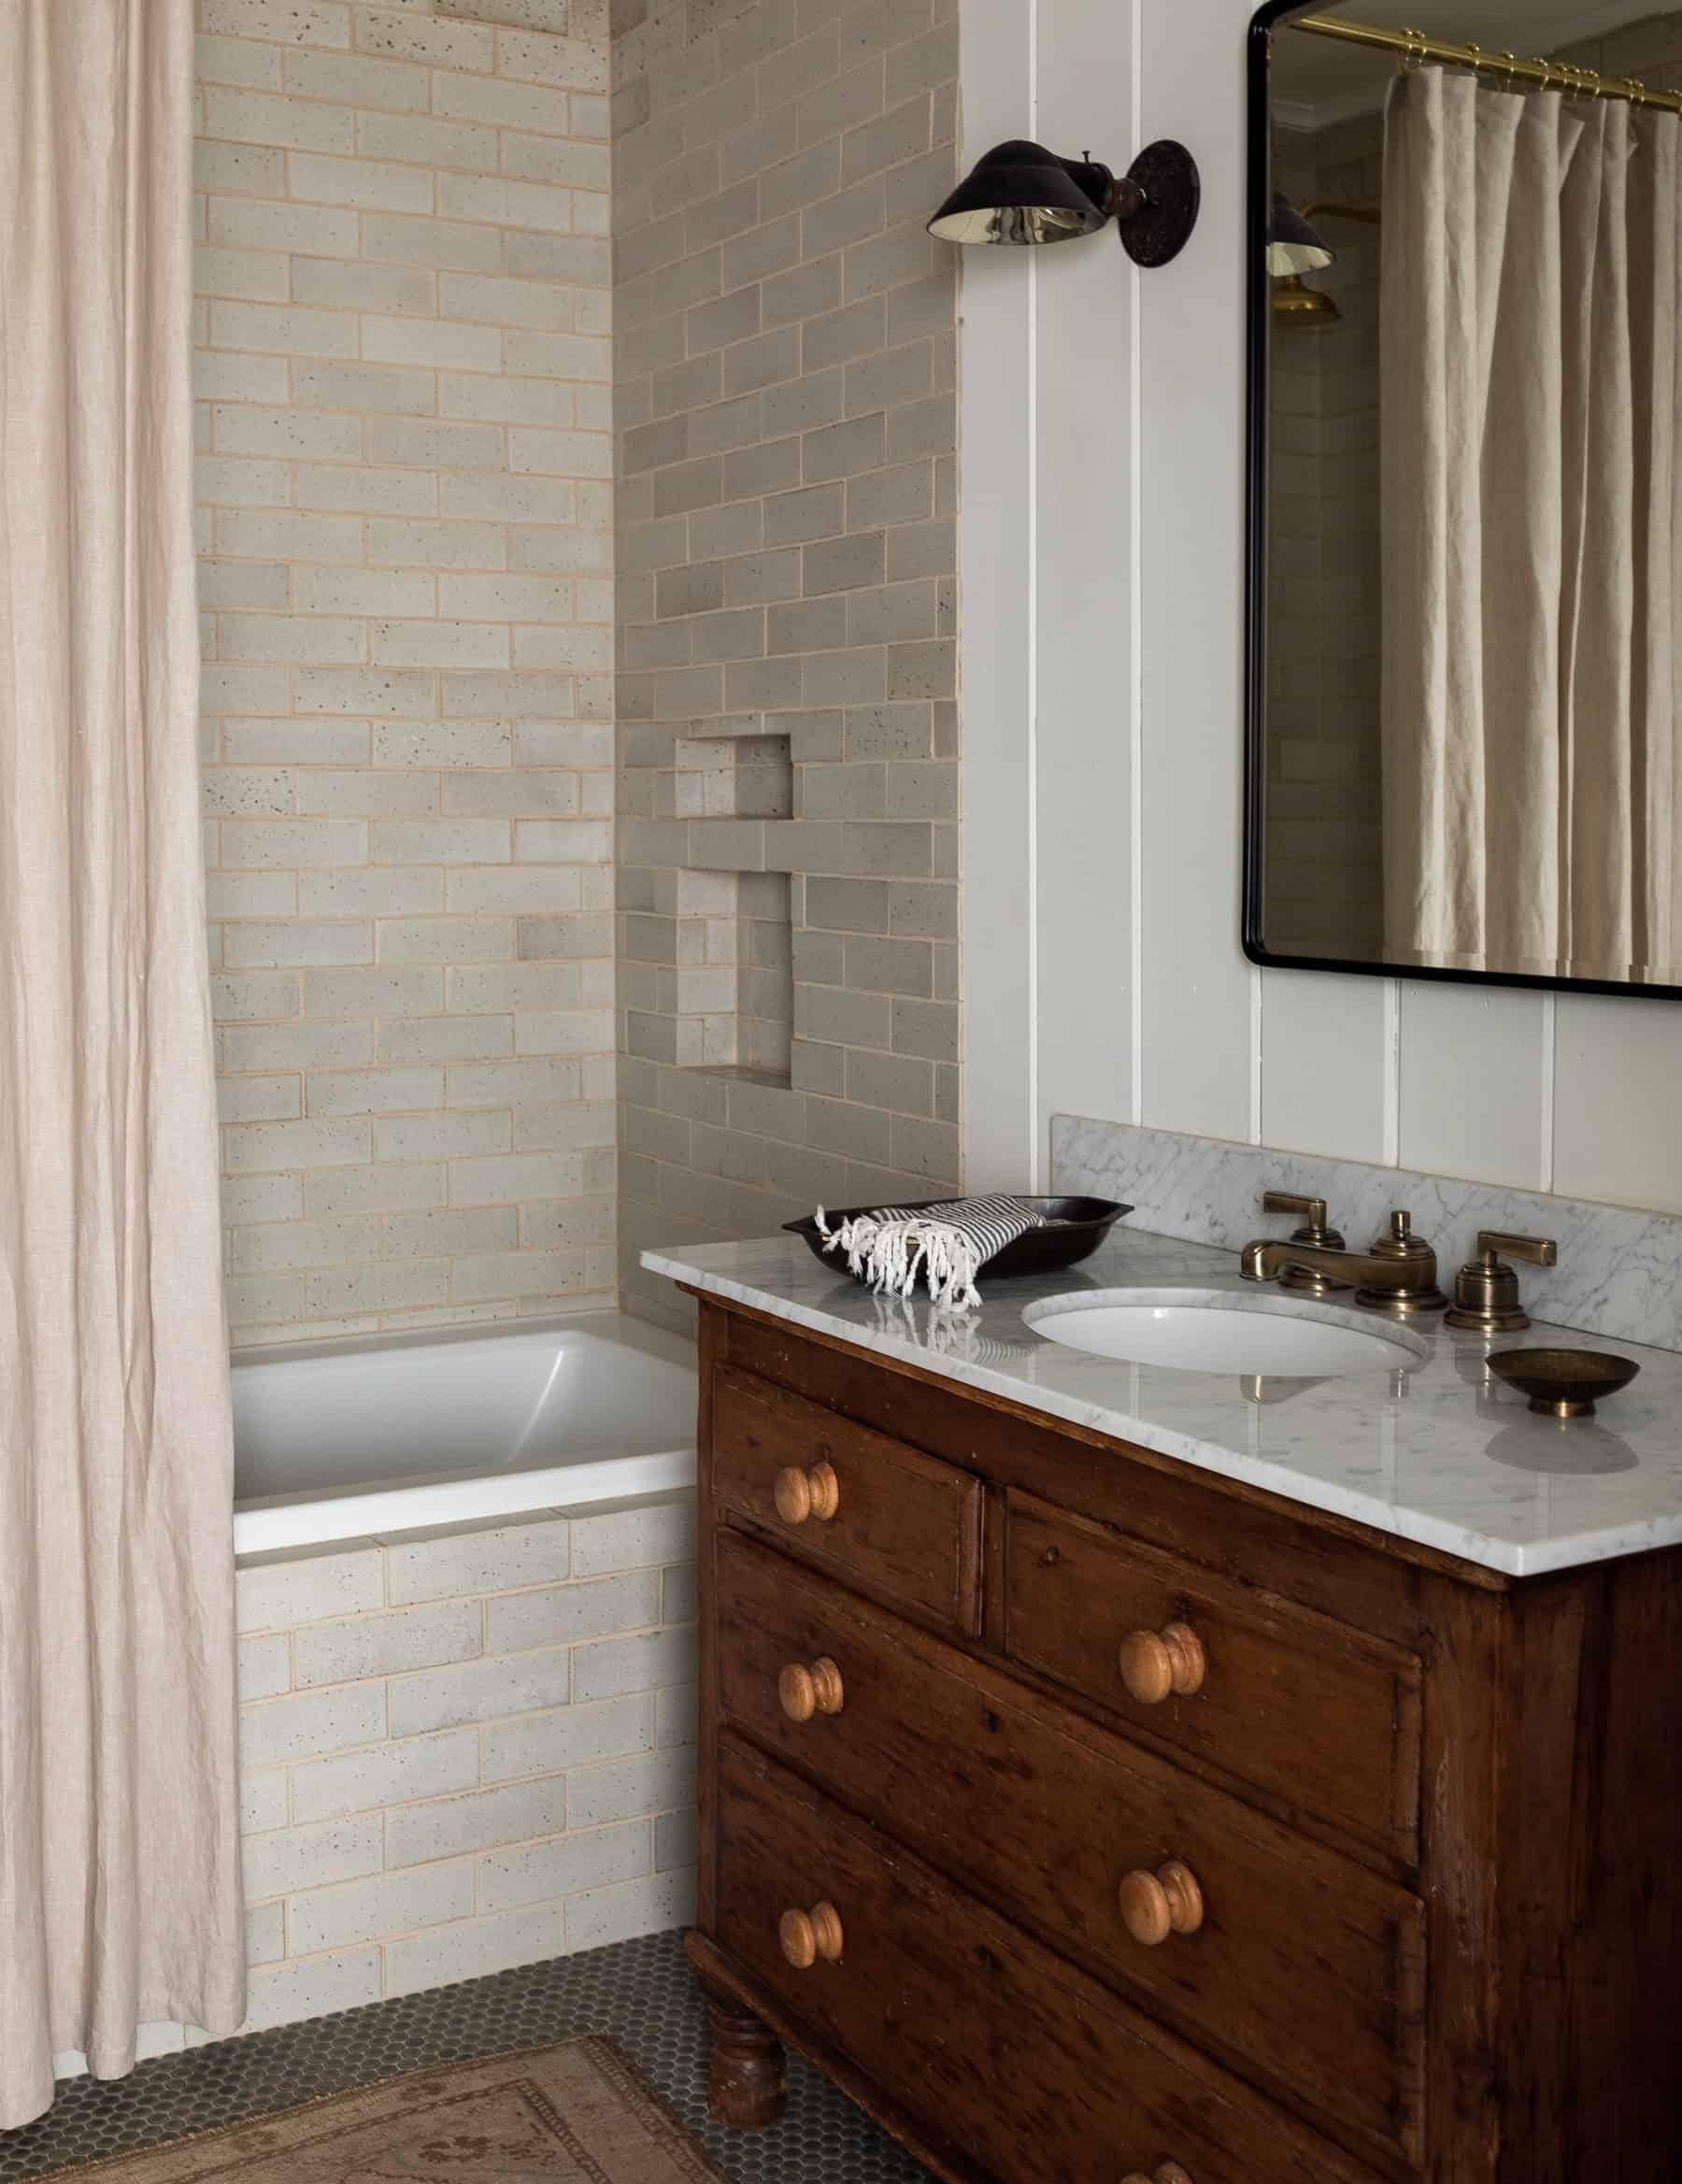 Heidi Caillier Design Seattle Interior Designer The Cabin And Snug Master Bathroom Modern Traditional Penny Tile